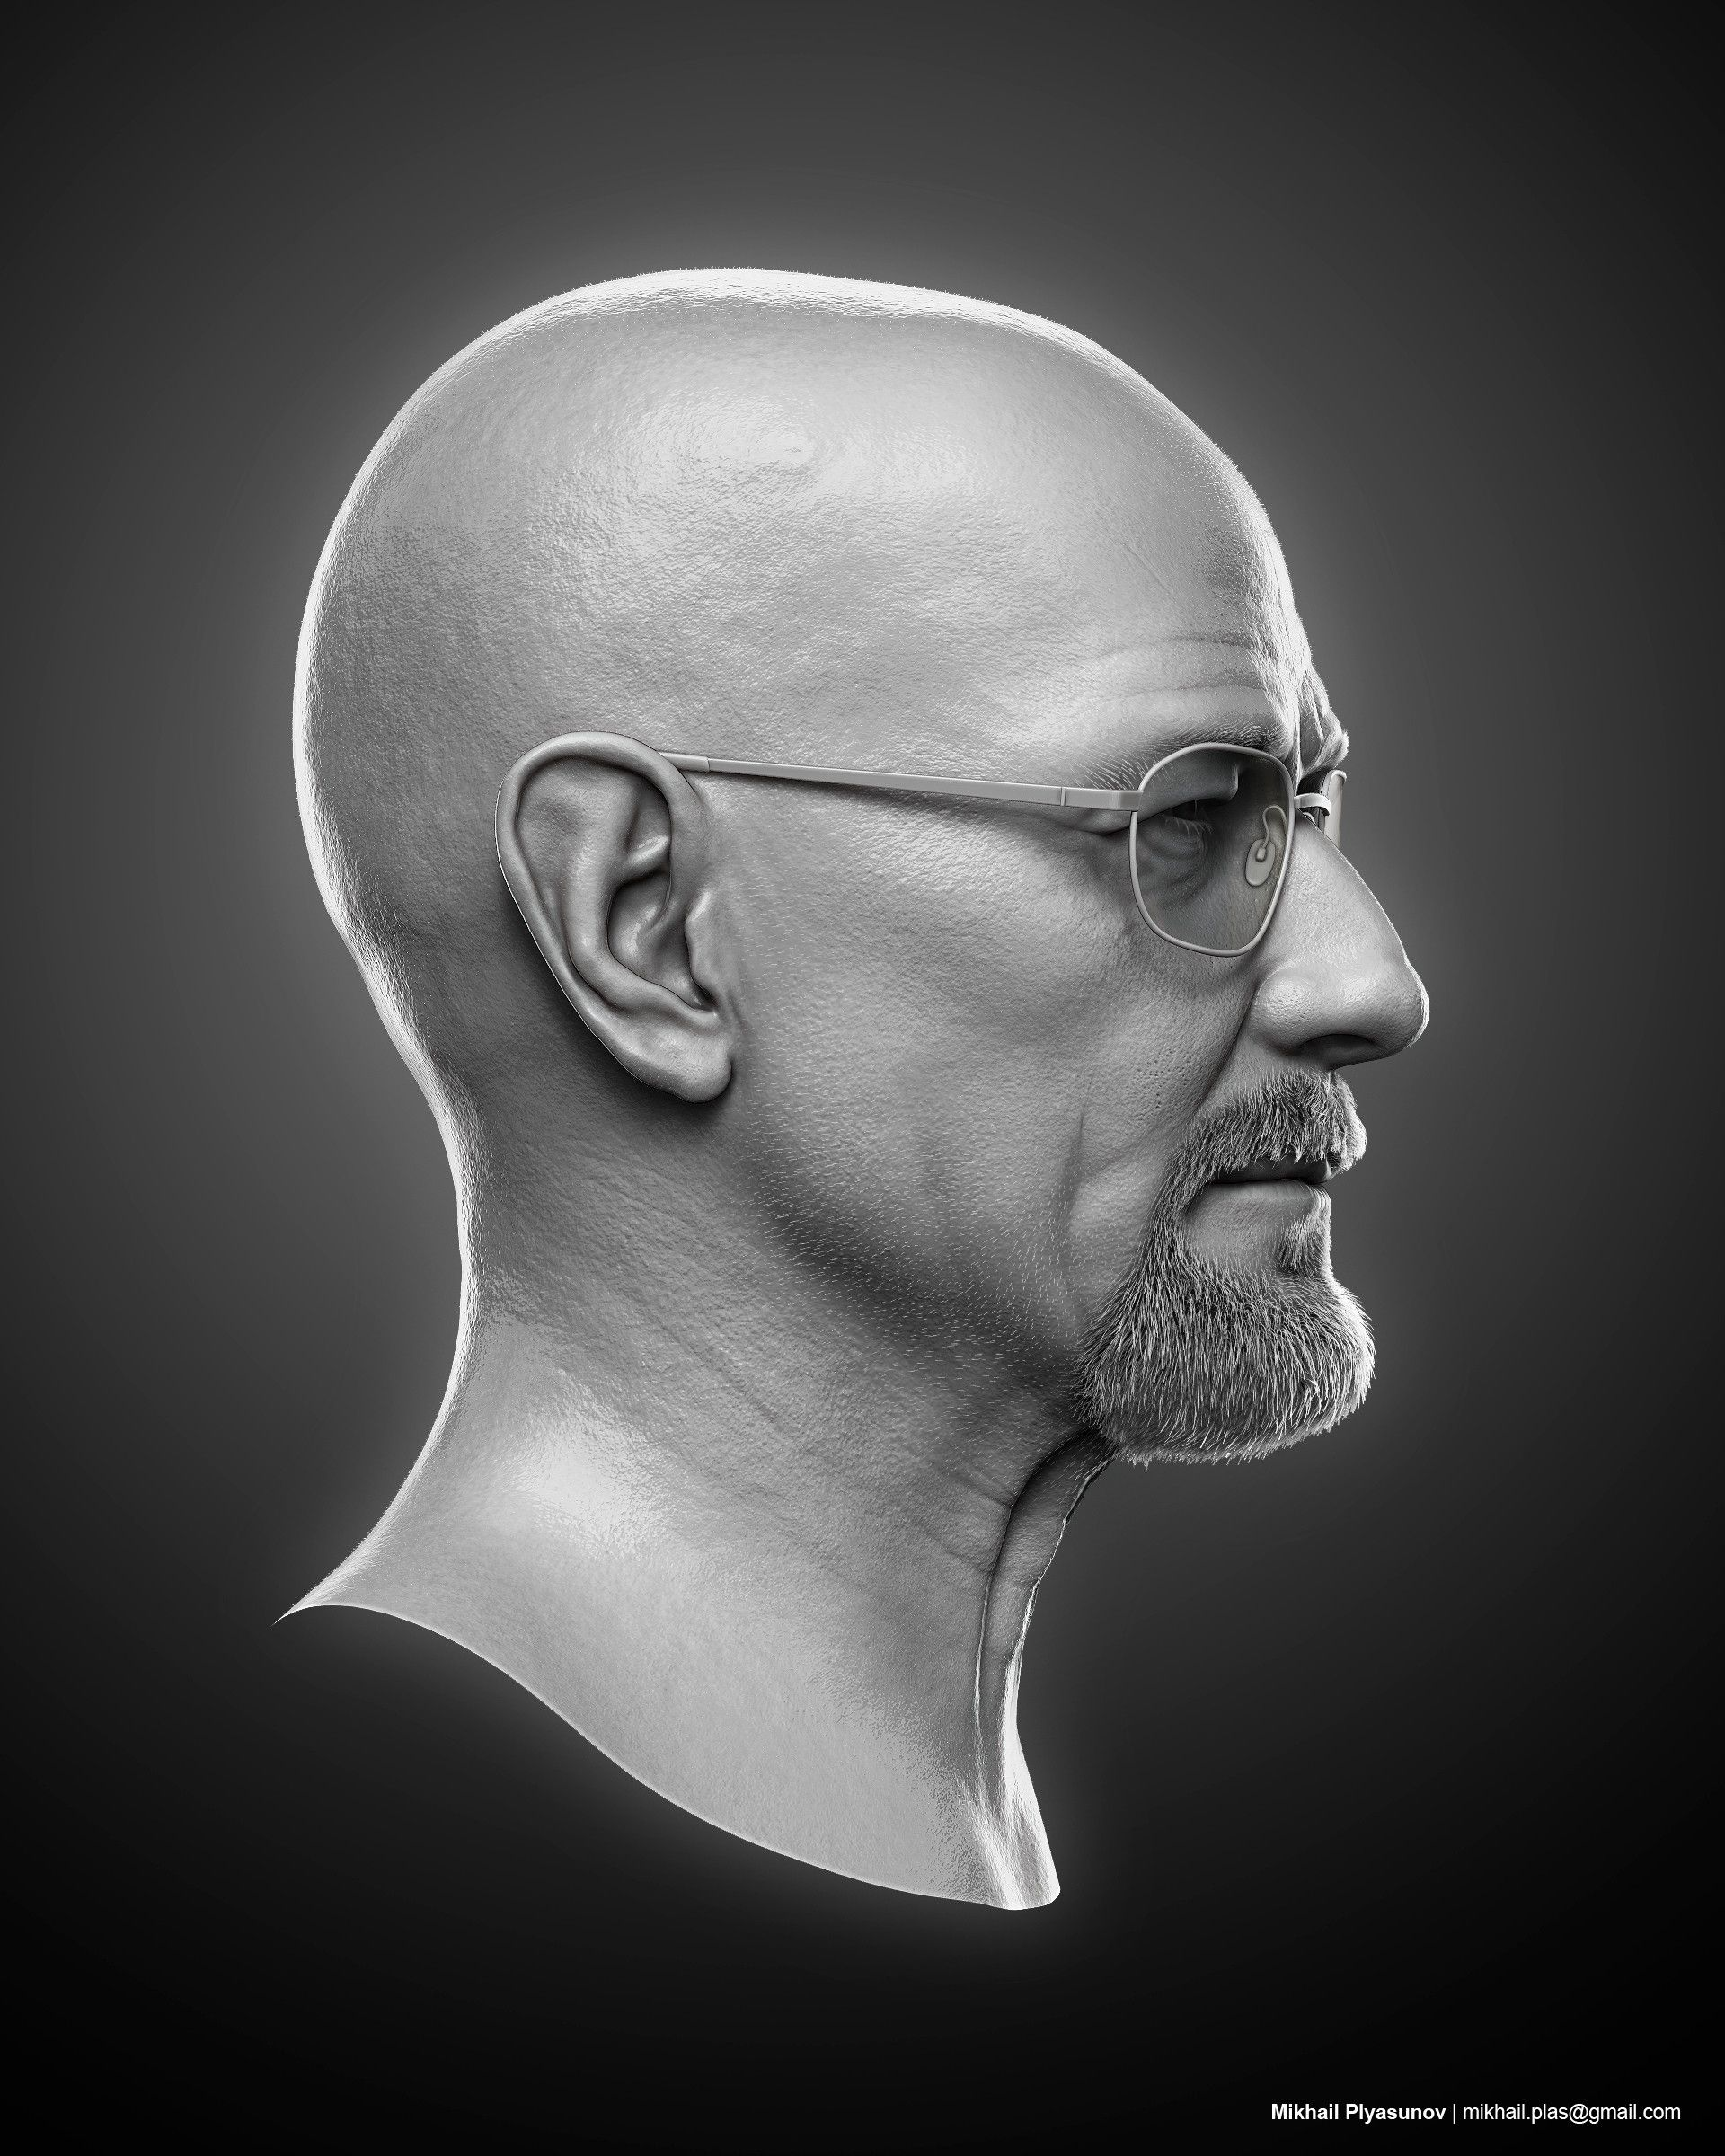 ArtStation - Walter White aka Heisenberg (Bryan Cranston) likeness sculpt., Mikhail Plyasunov